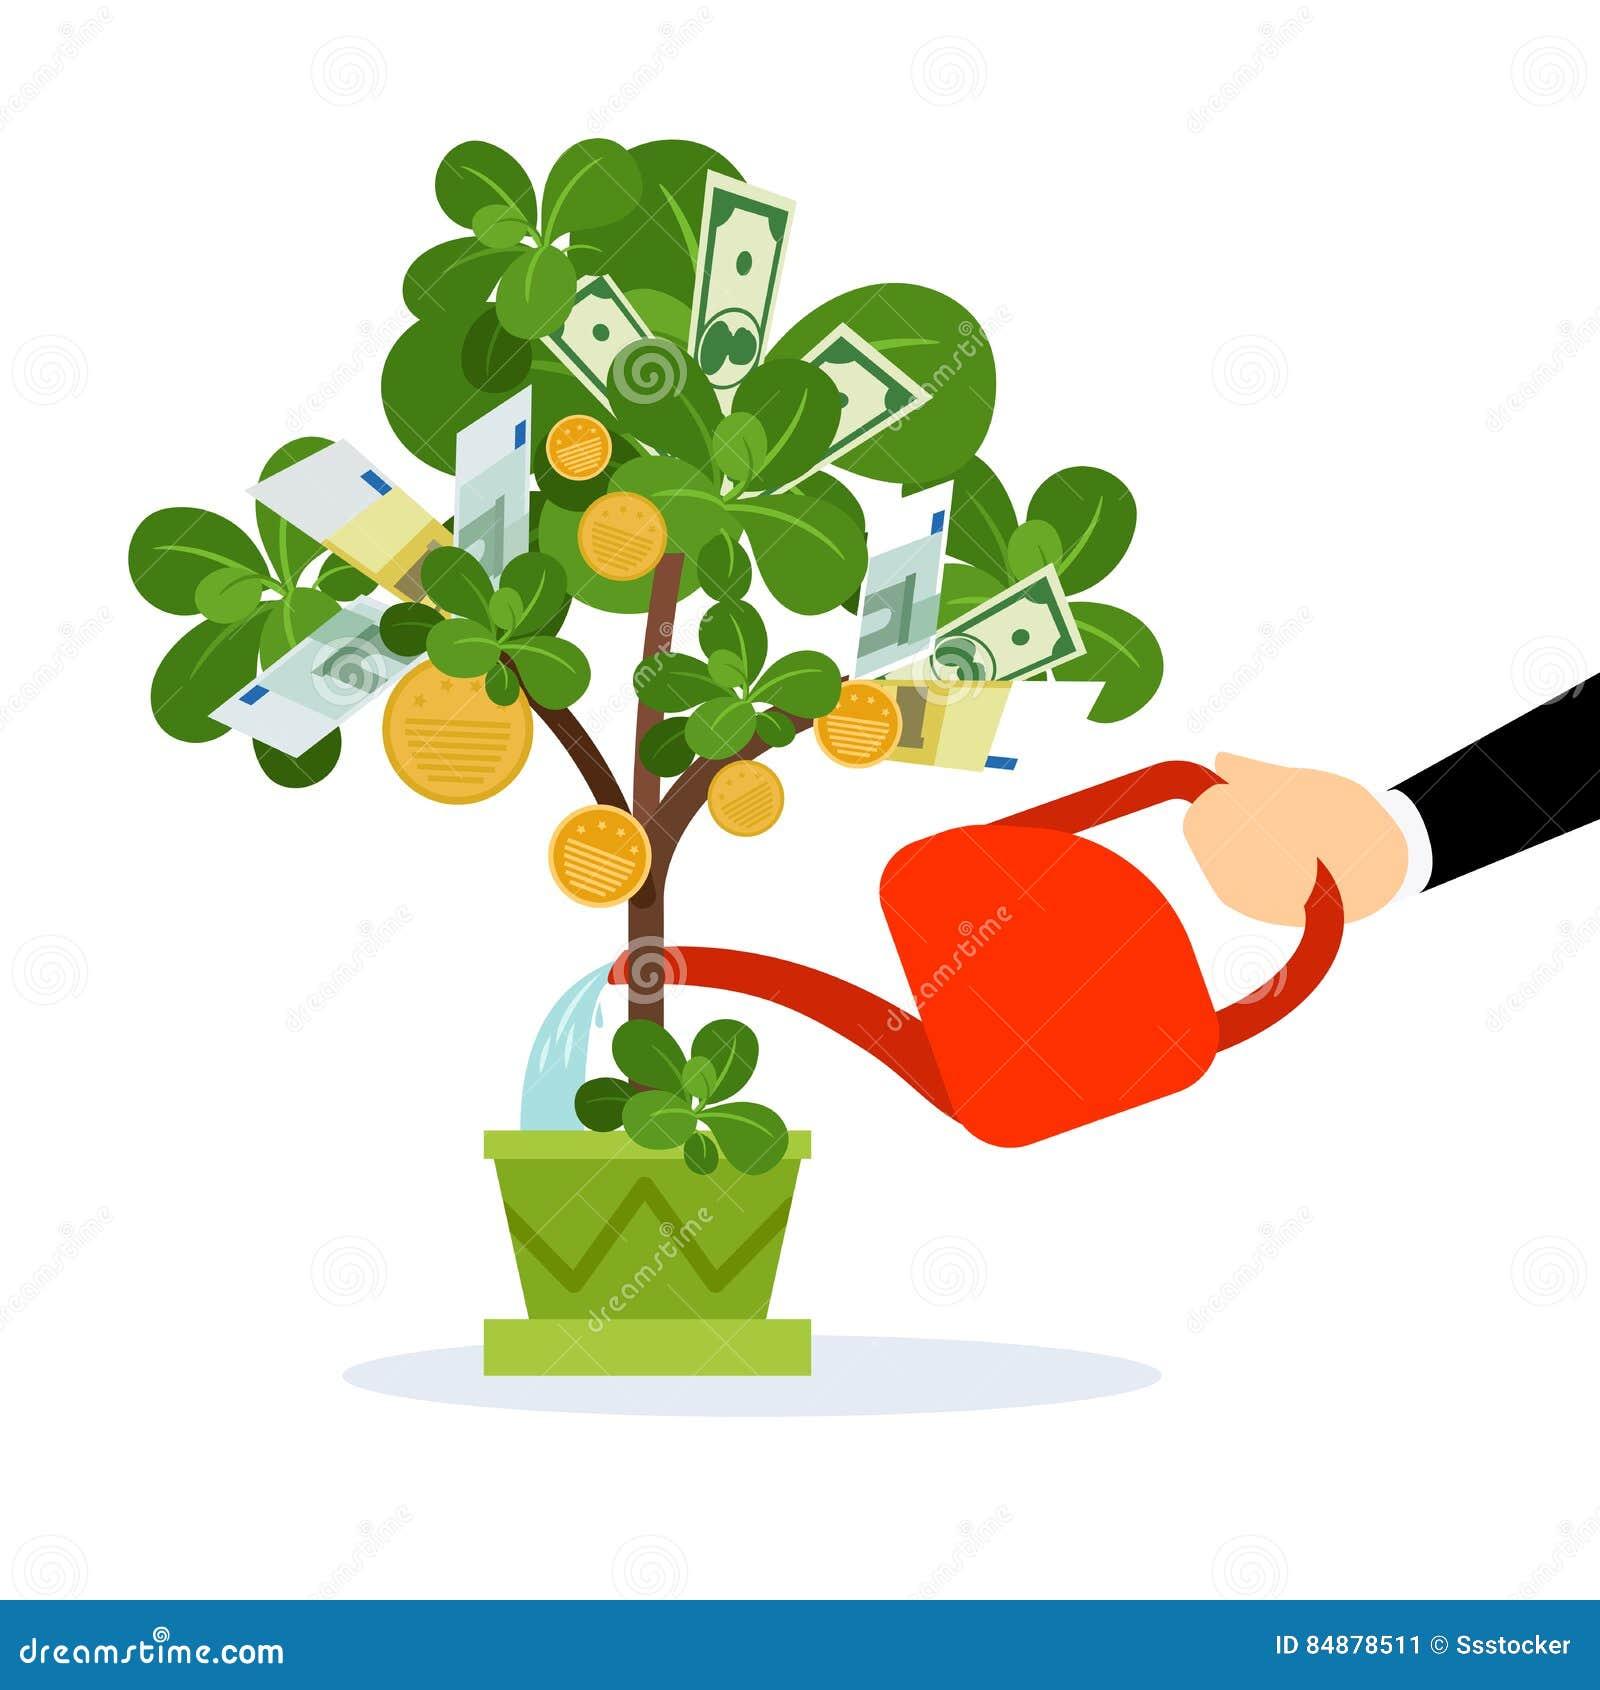 money tree care illustration stock vector illustration of finance rh dreamstime com Save Money Clip Art Money Bag Clip Art